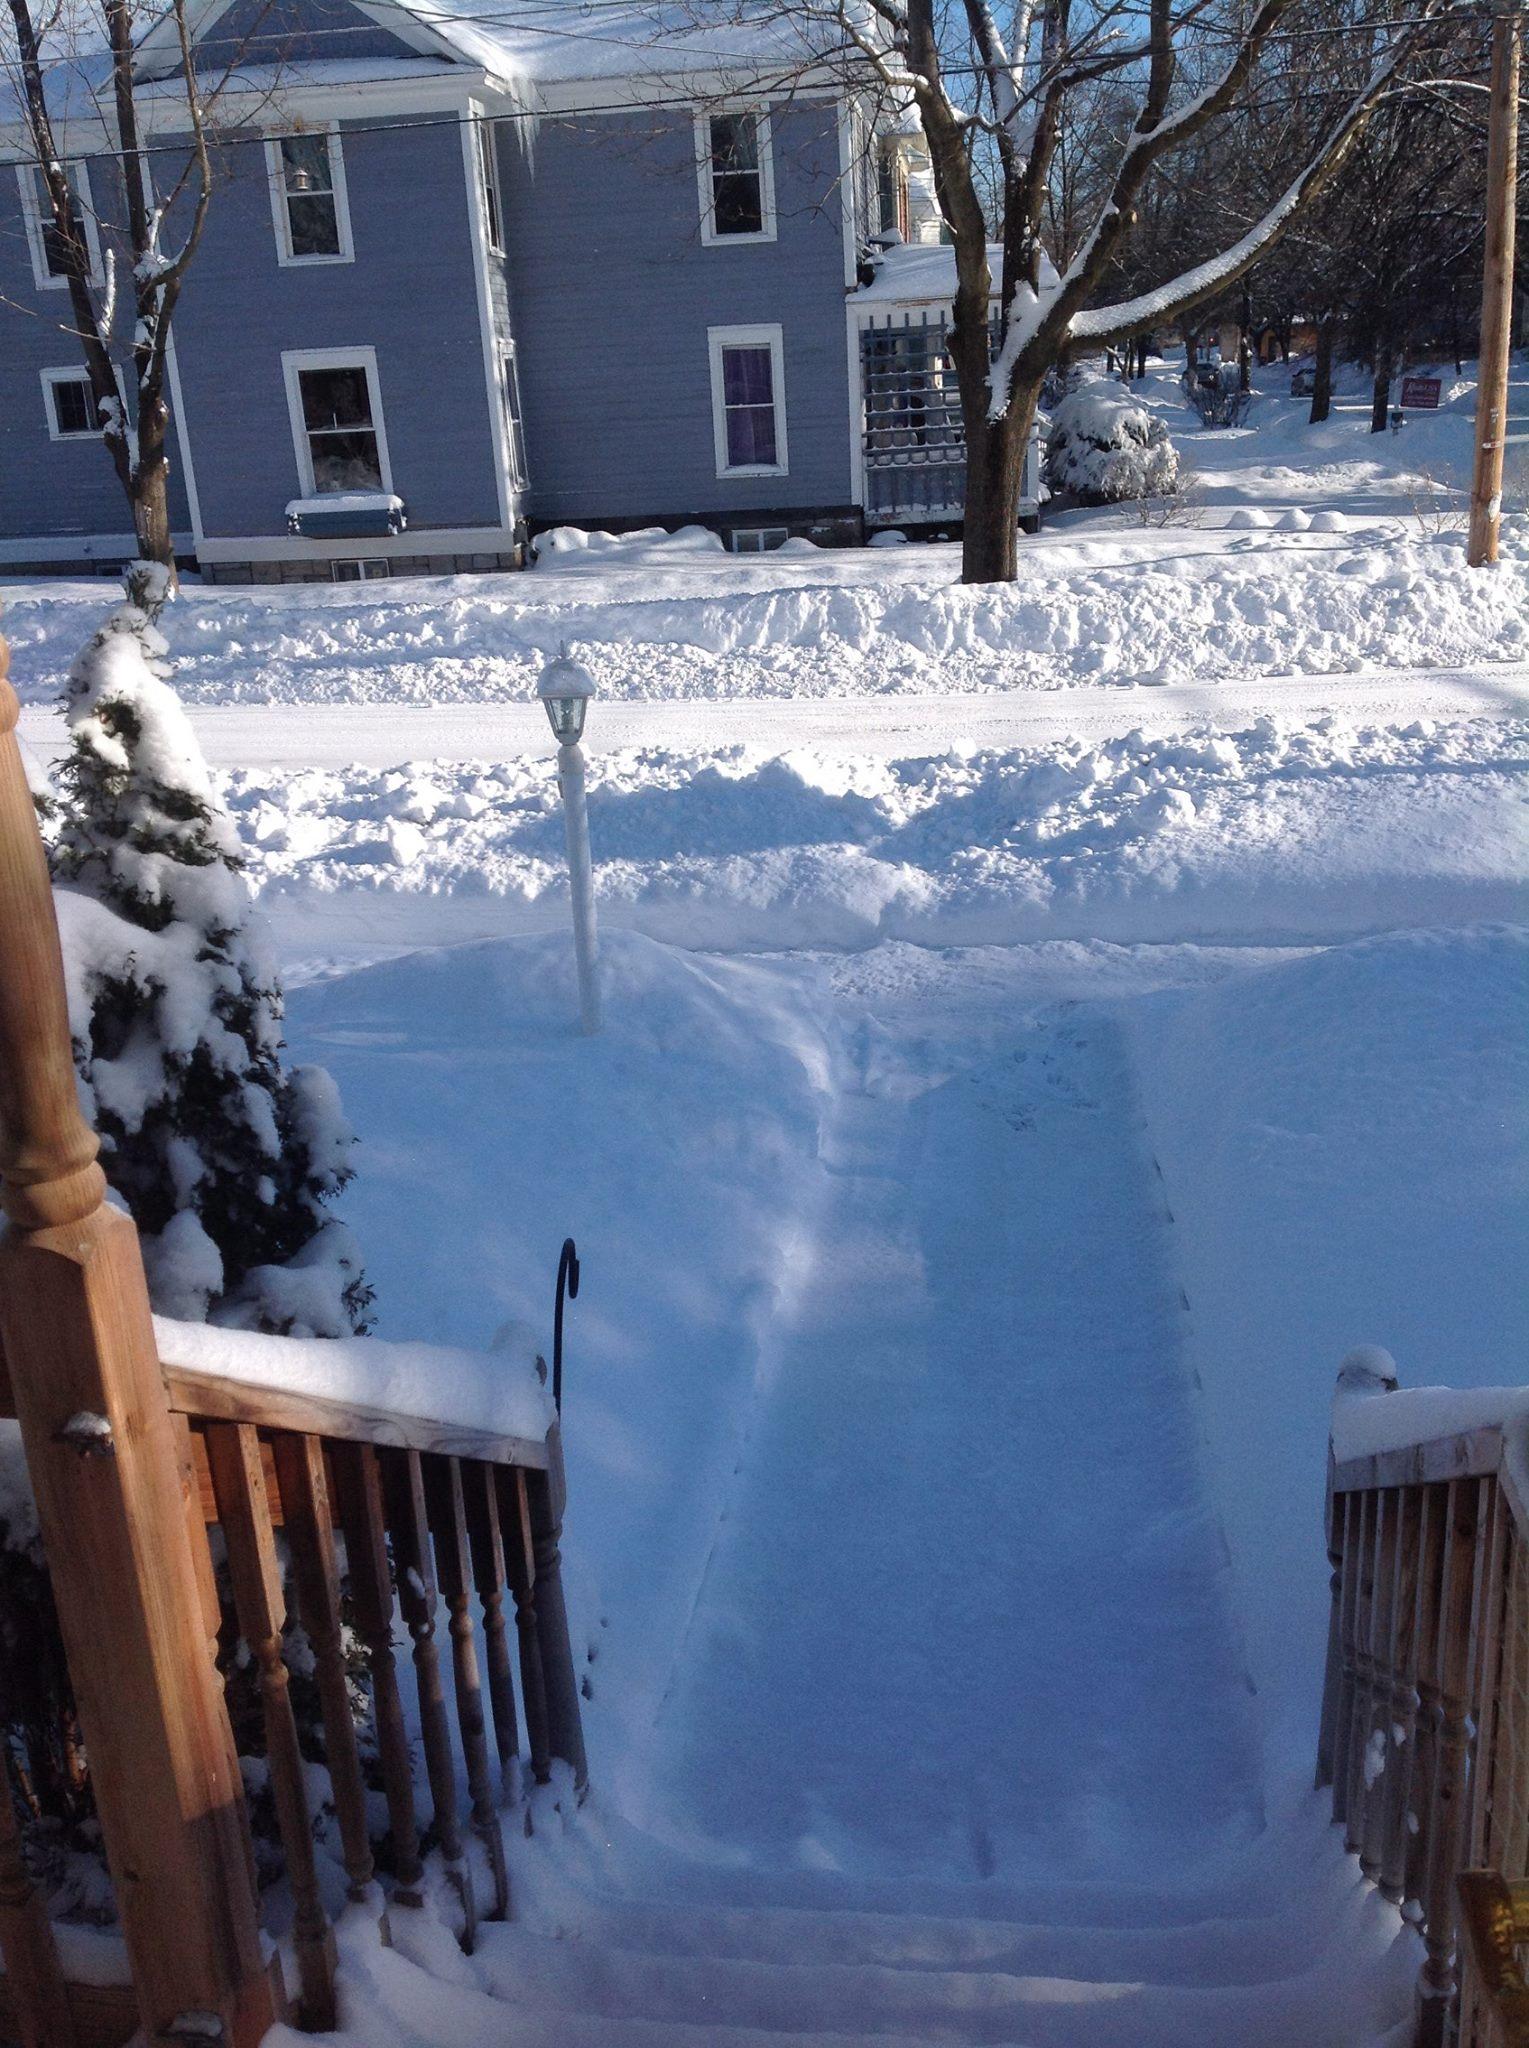 Davies Street Snow in February